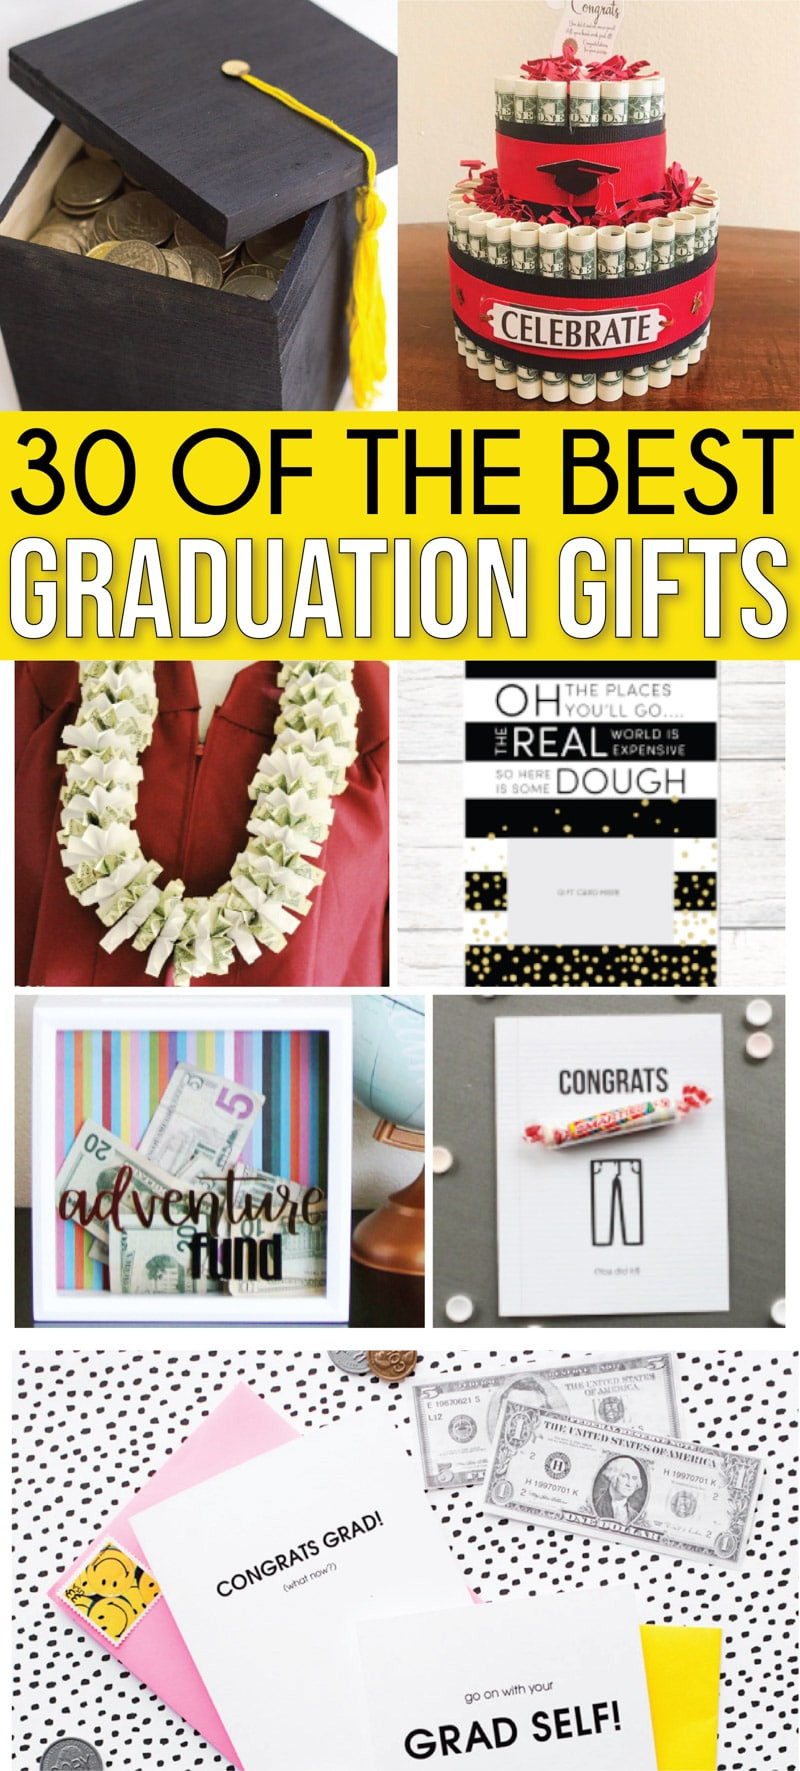 High School Graduation Gift Ideas For Guys  30 Awesome High School Graduation Gifts Graduates Actually